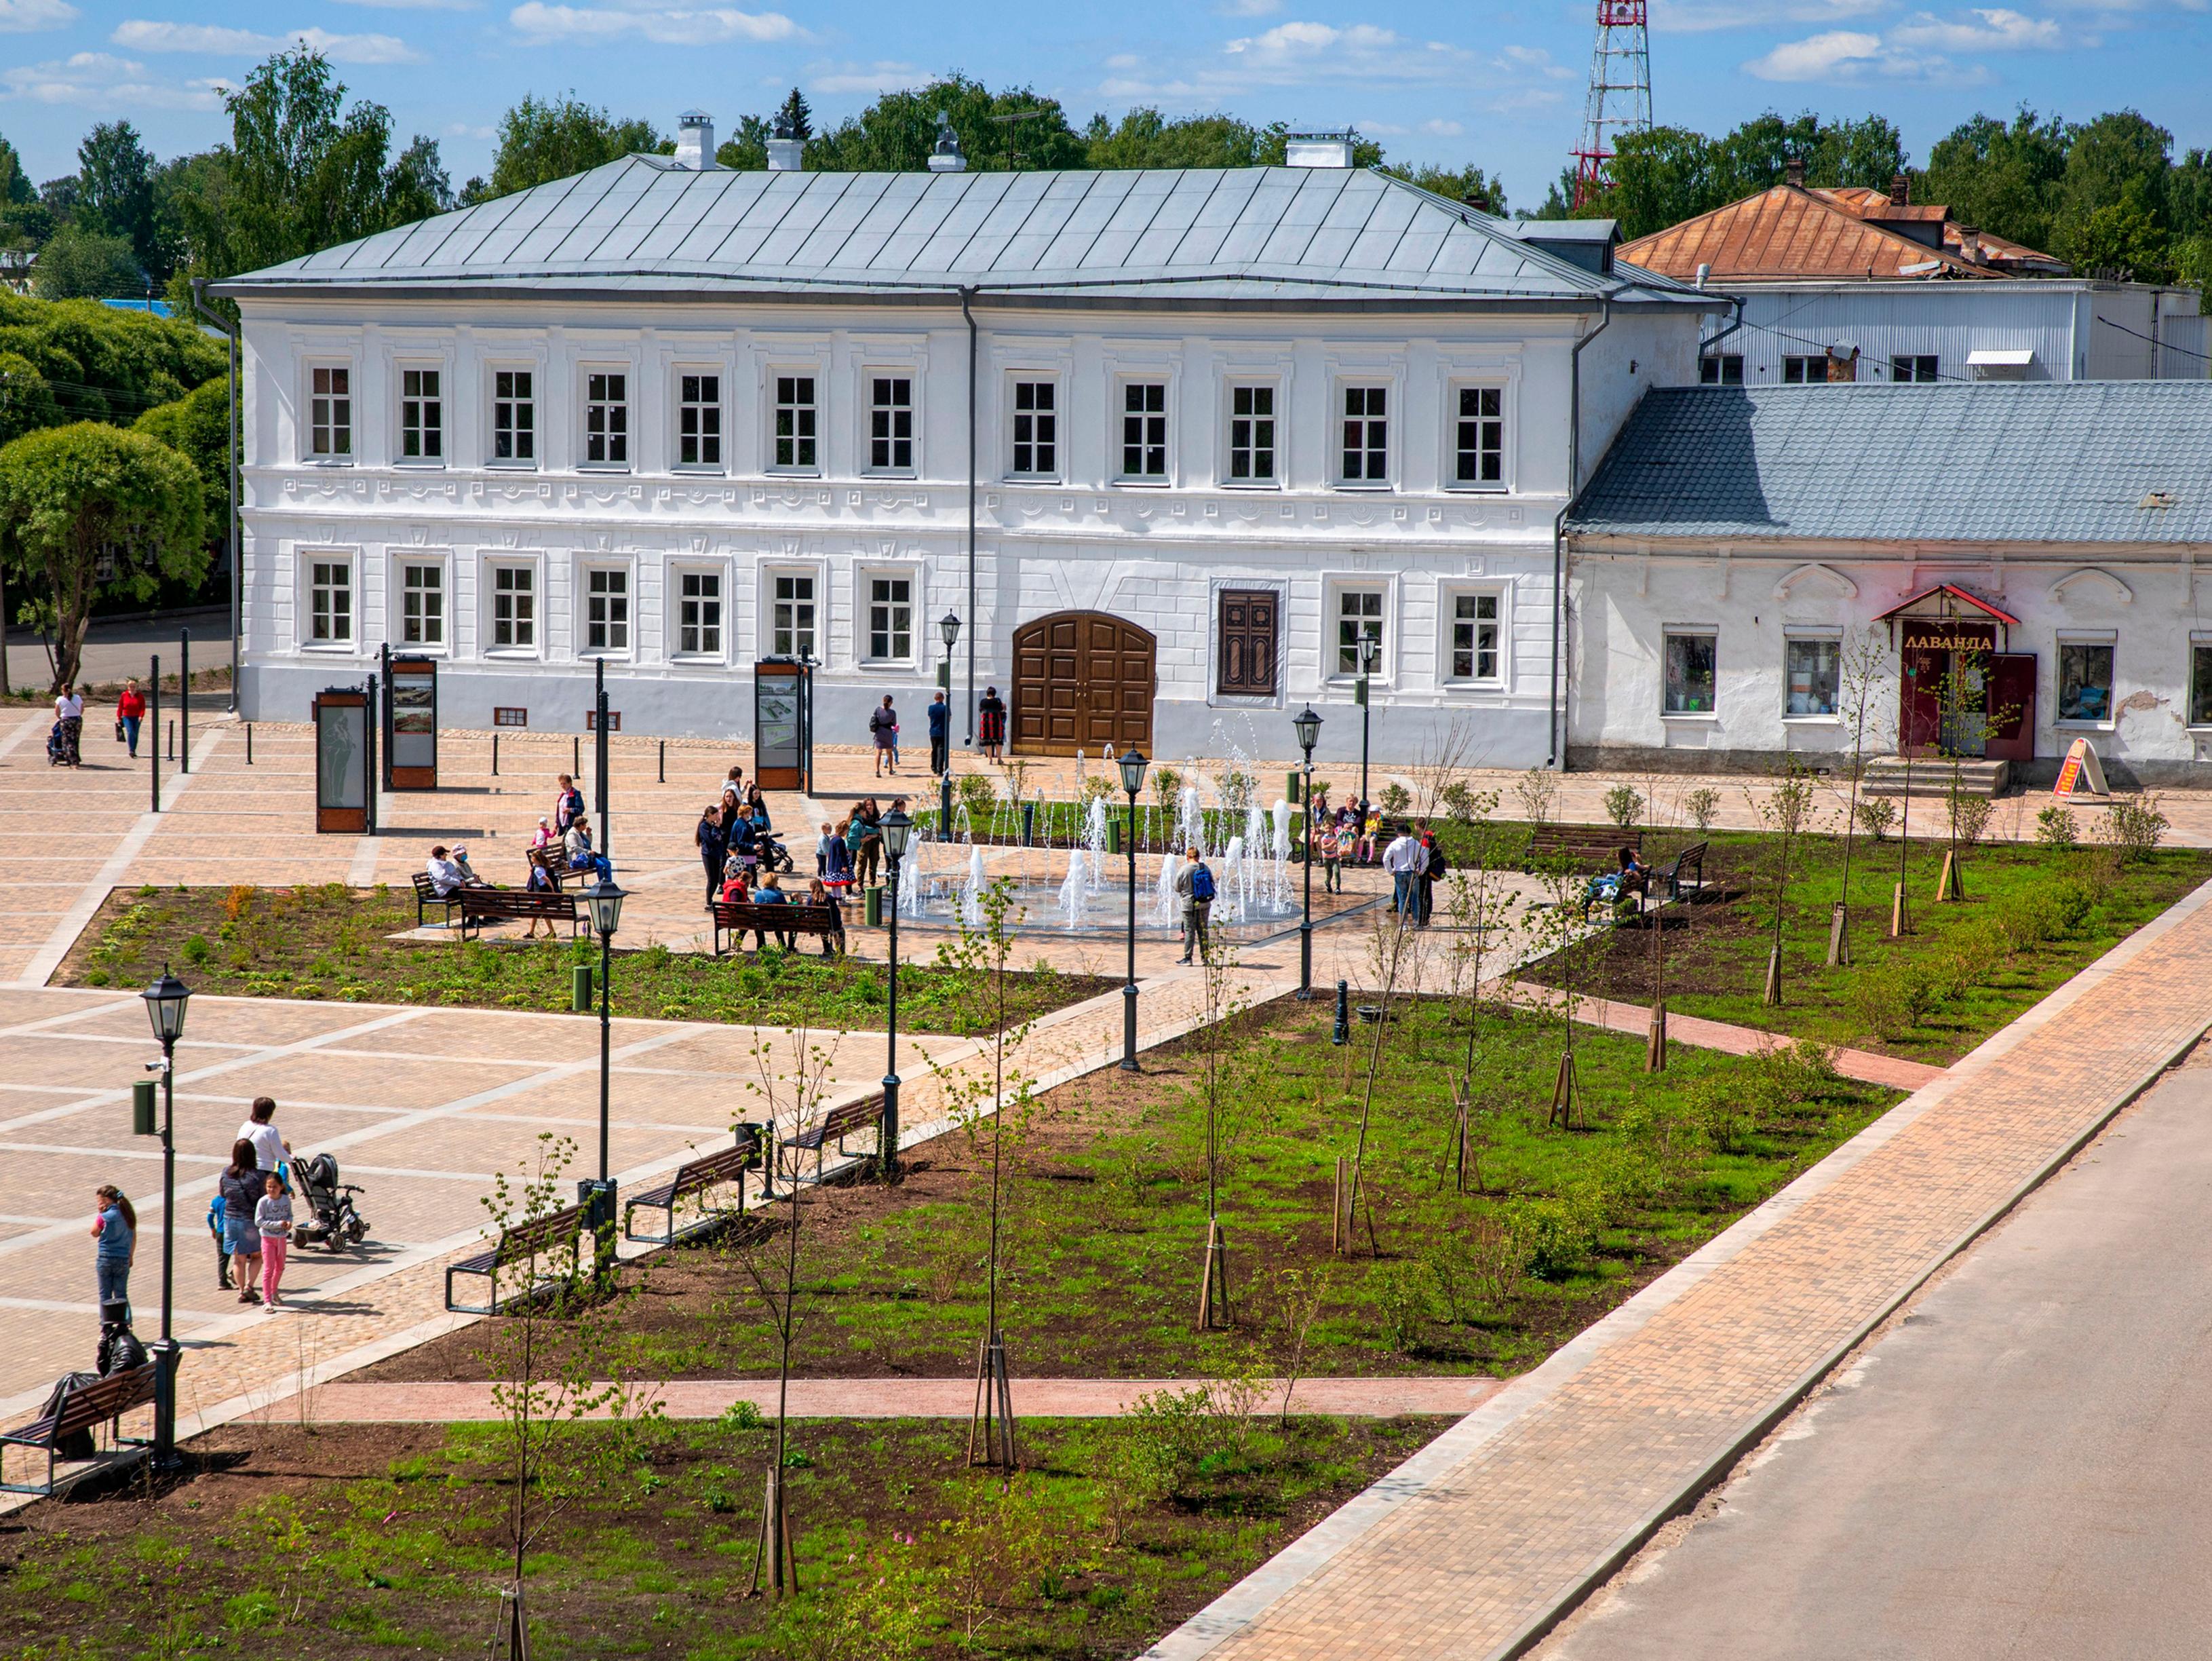 6Фото площади после реновации ФОНТАН